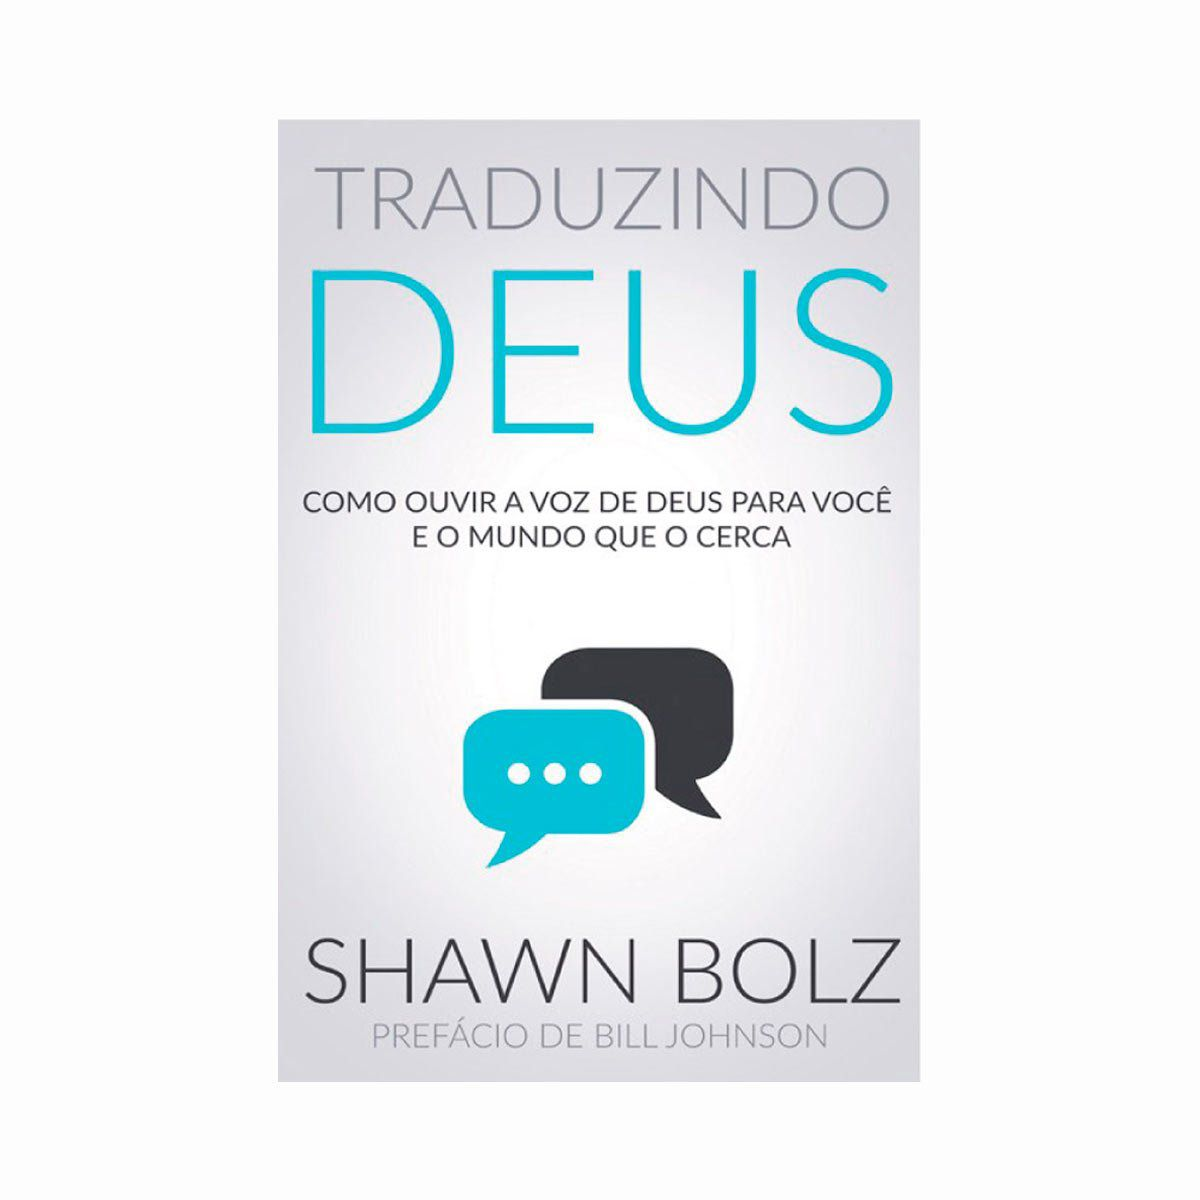 Traduzindo Deus   - JesusCopy